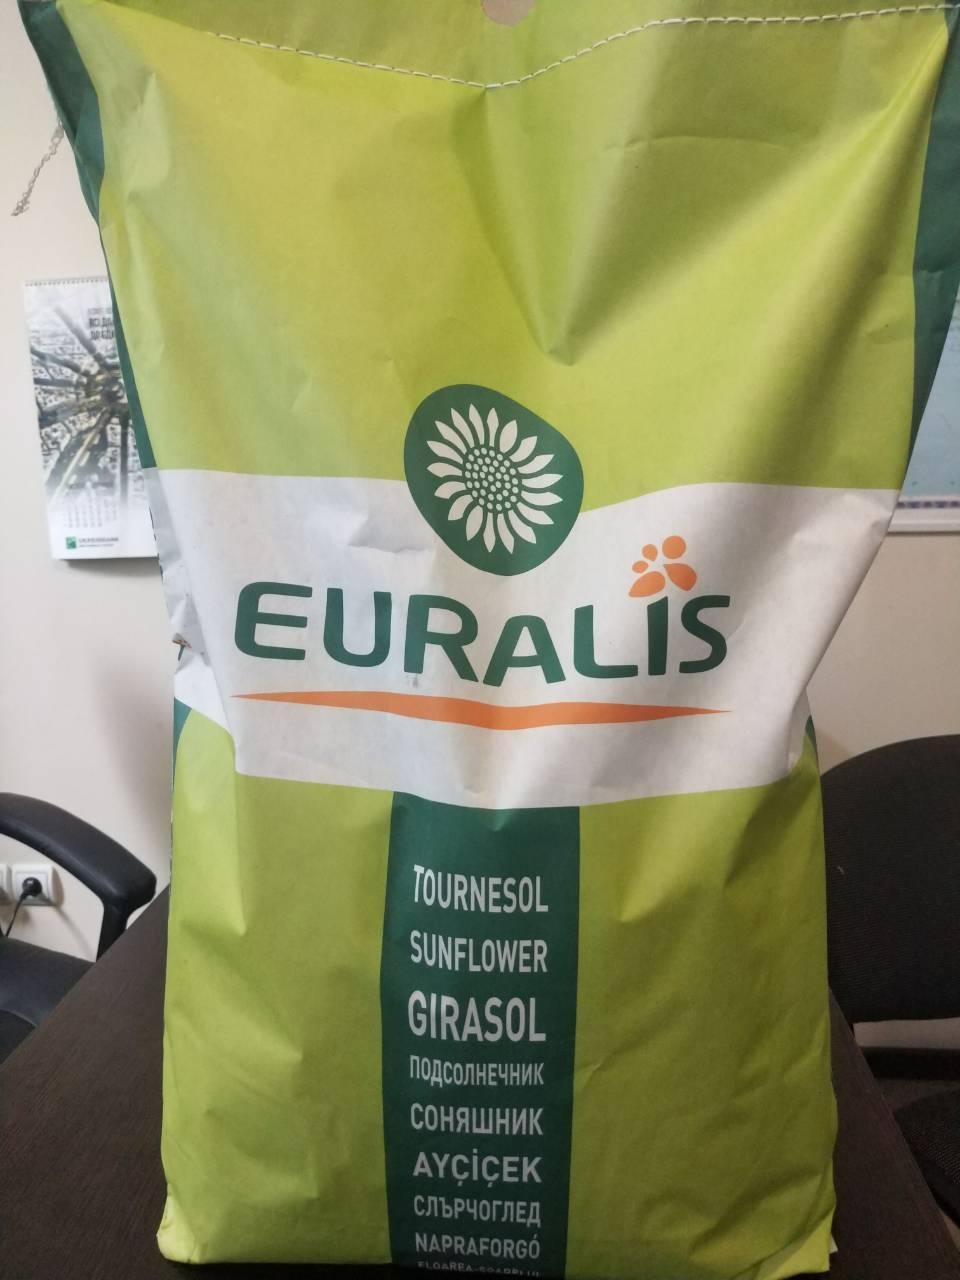 Euralis Евралис ЕС Ниагара Классический